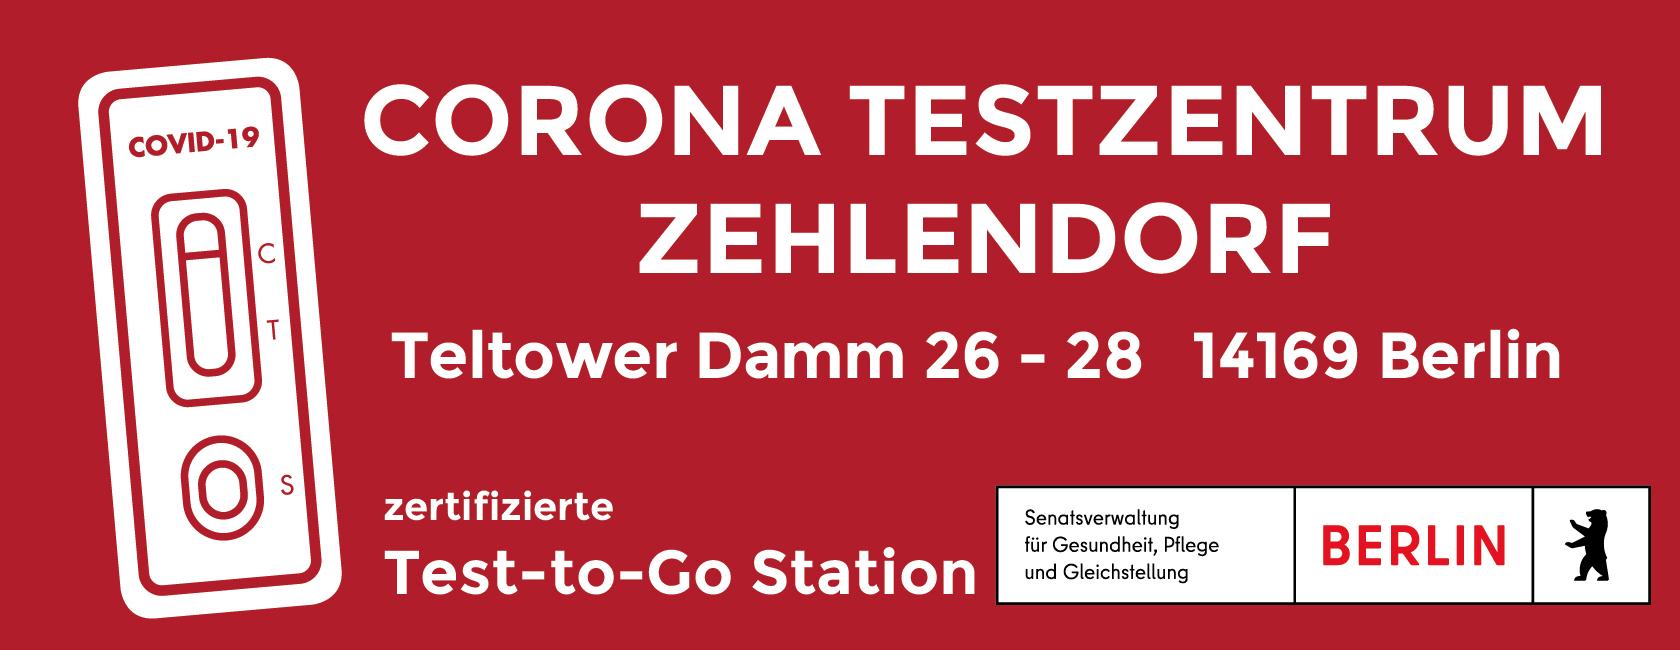 Logo TZ Zehlendorf neu 1